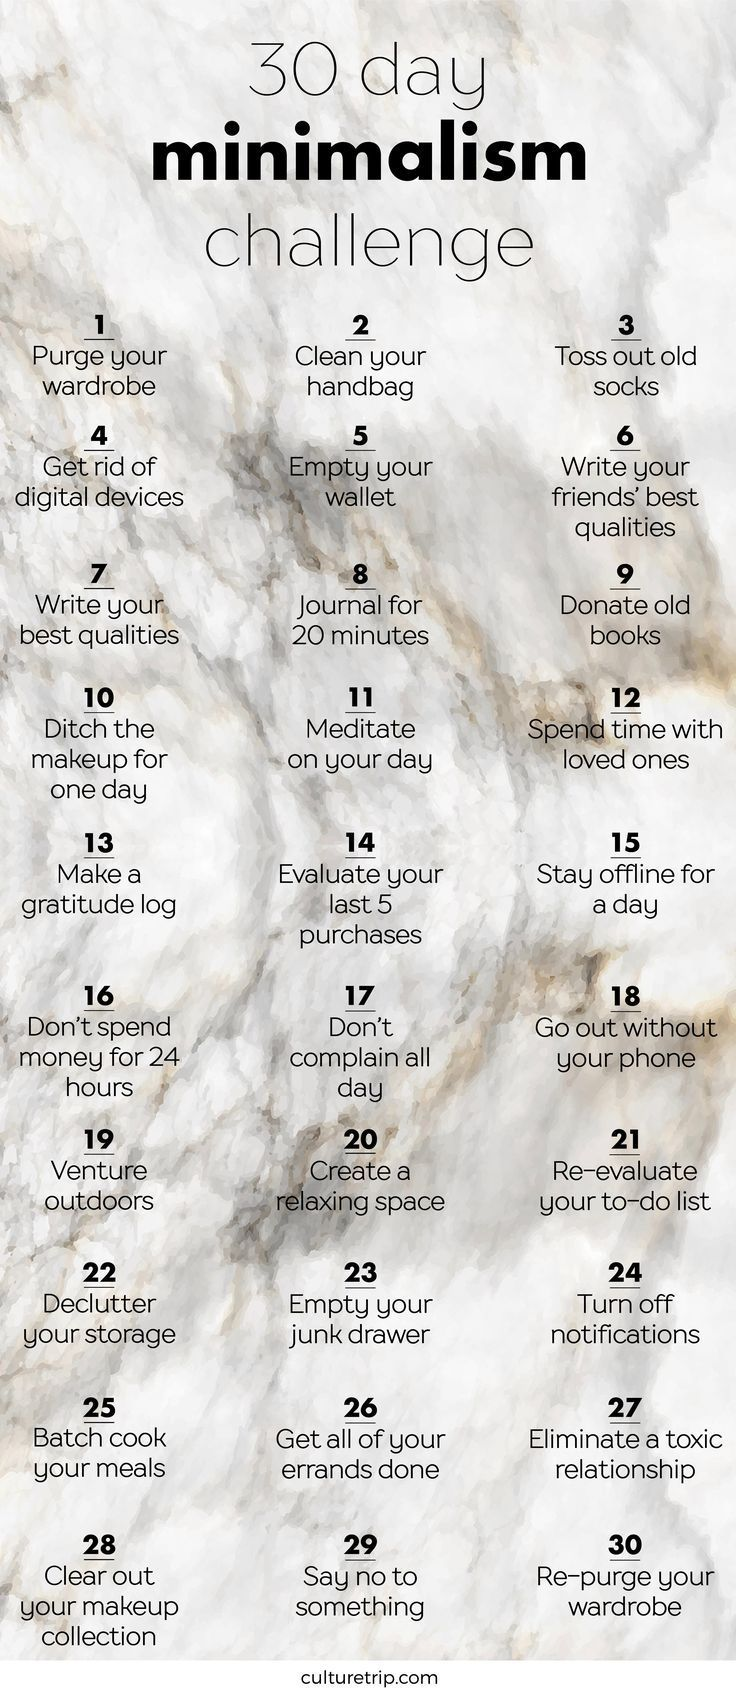 The 30 Day Minimalism ChallengeBecca Ludlum   My Crazy Good Life®